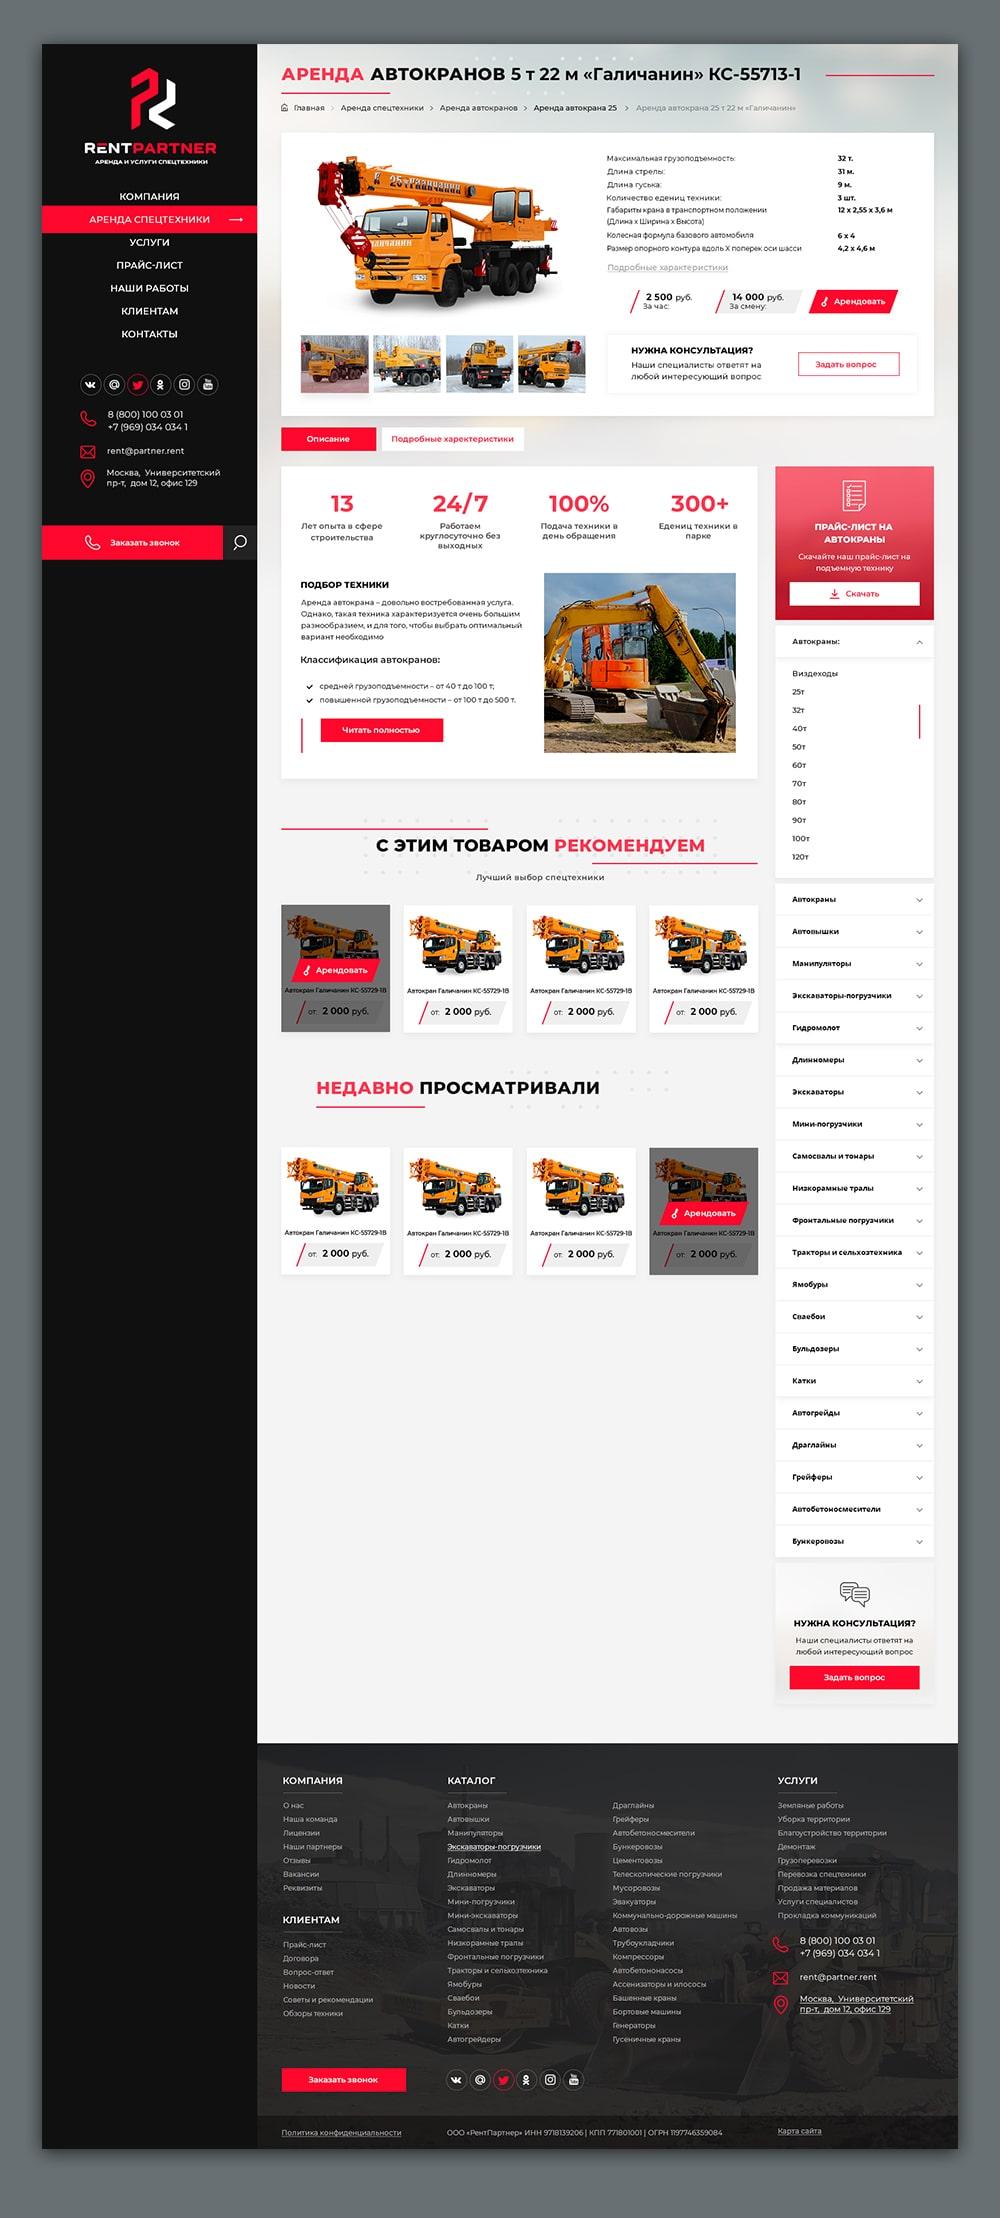 Дизайн сайта | аренда спецтехники